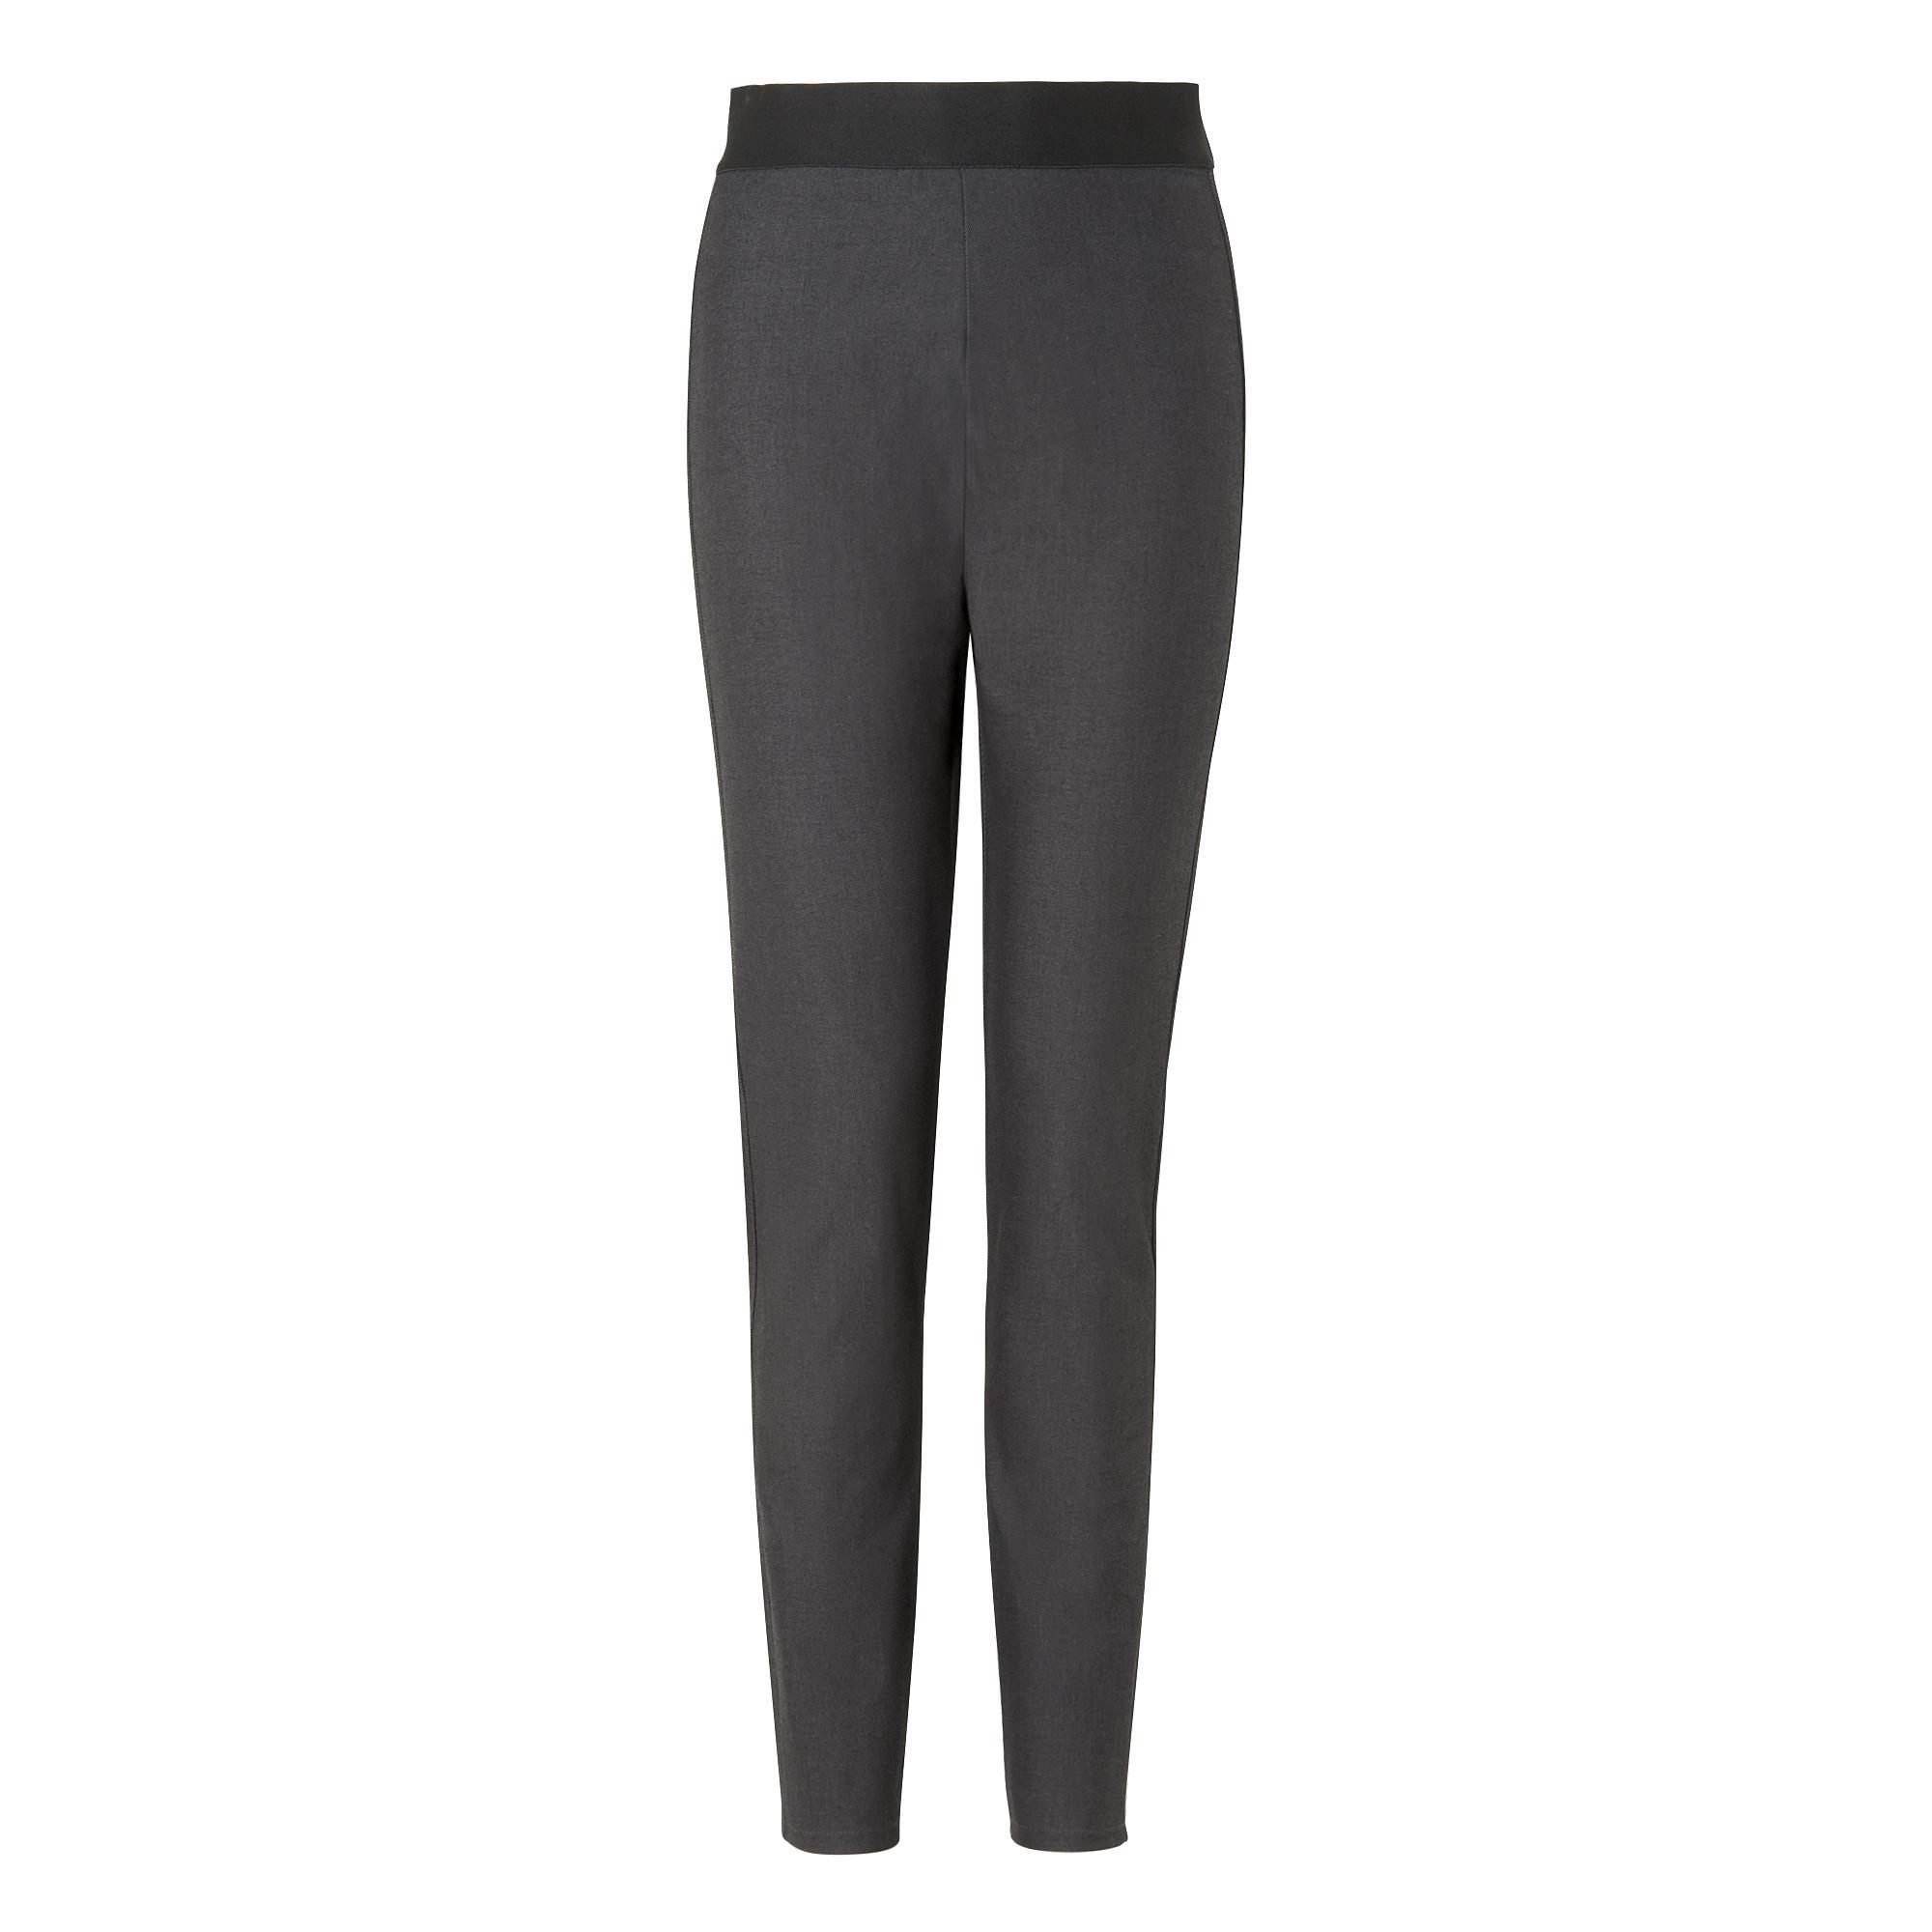 Adella Grey Skinny Pants